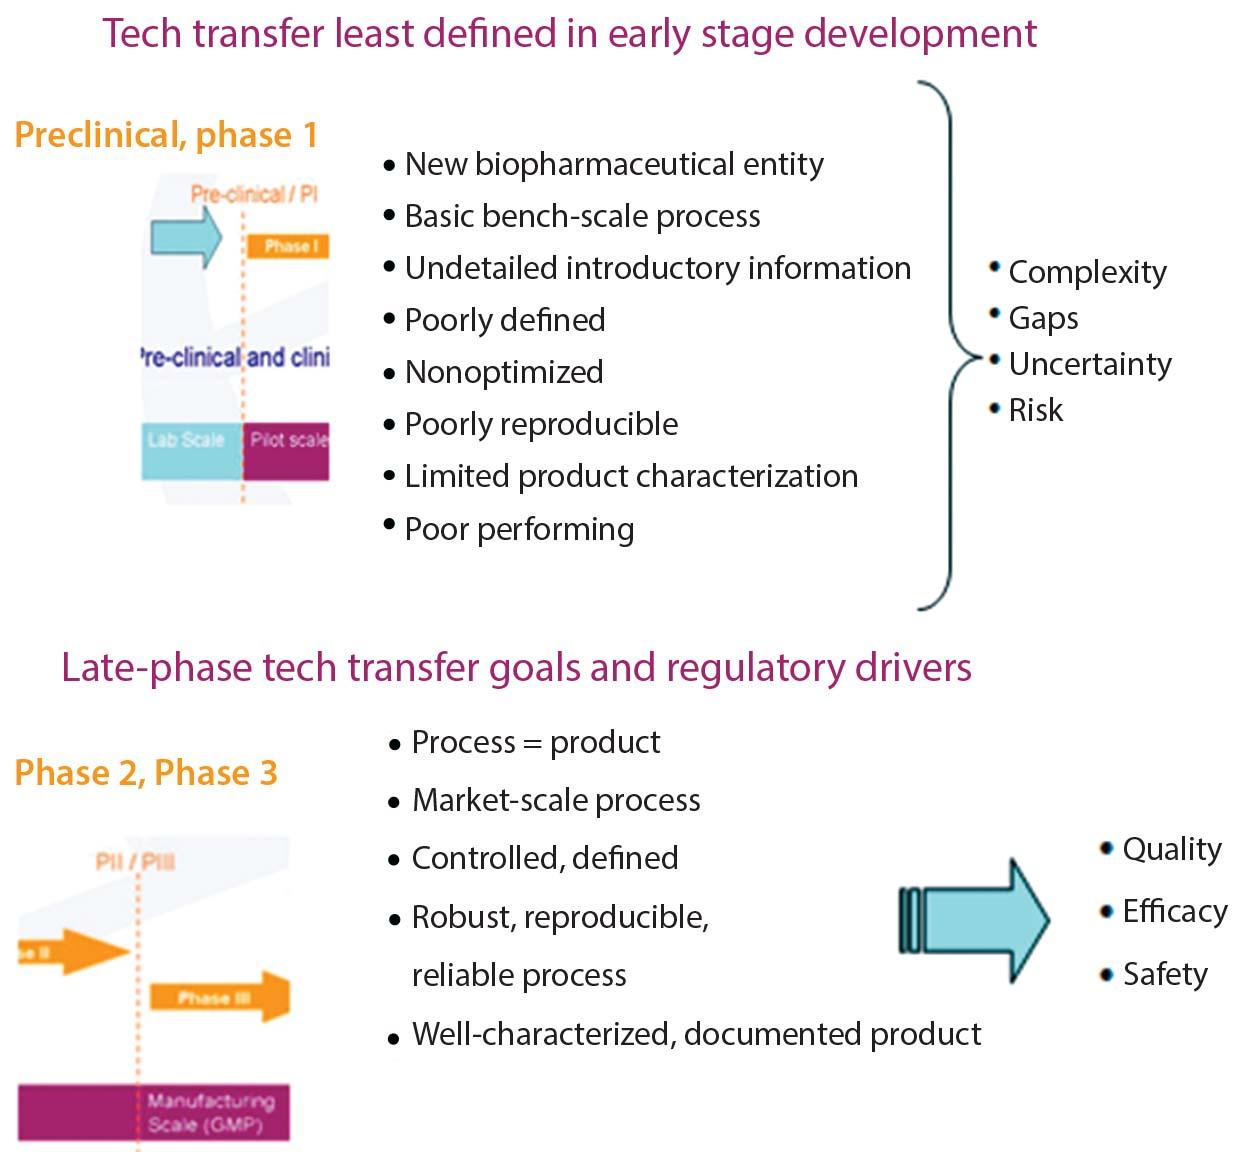 Technology Management Image: Modern Technology Transfer Strategies For